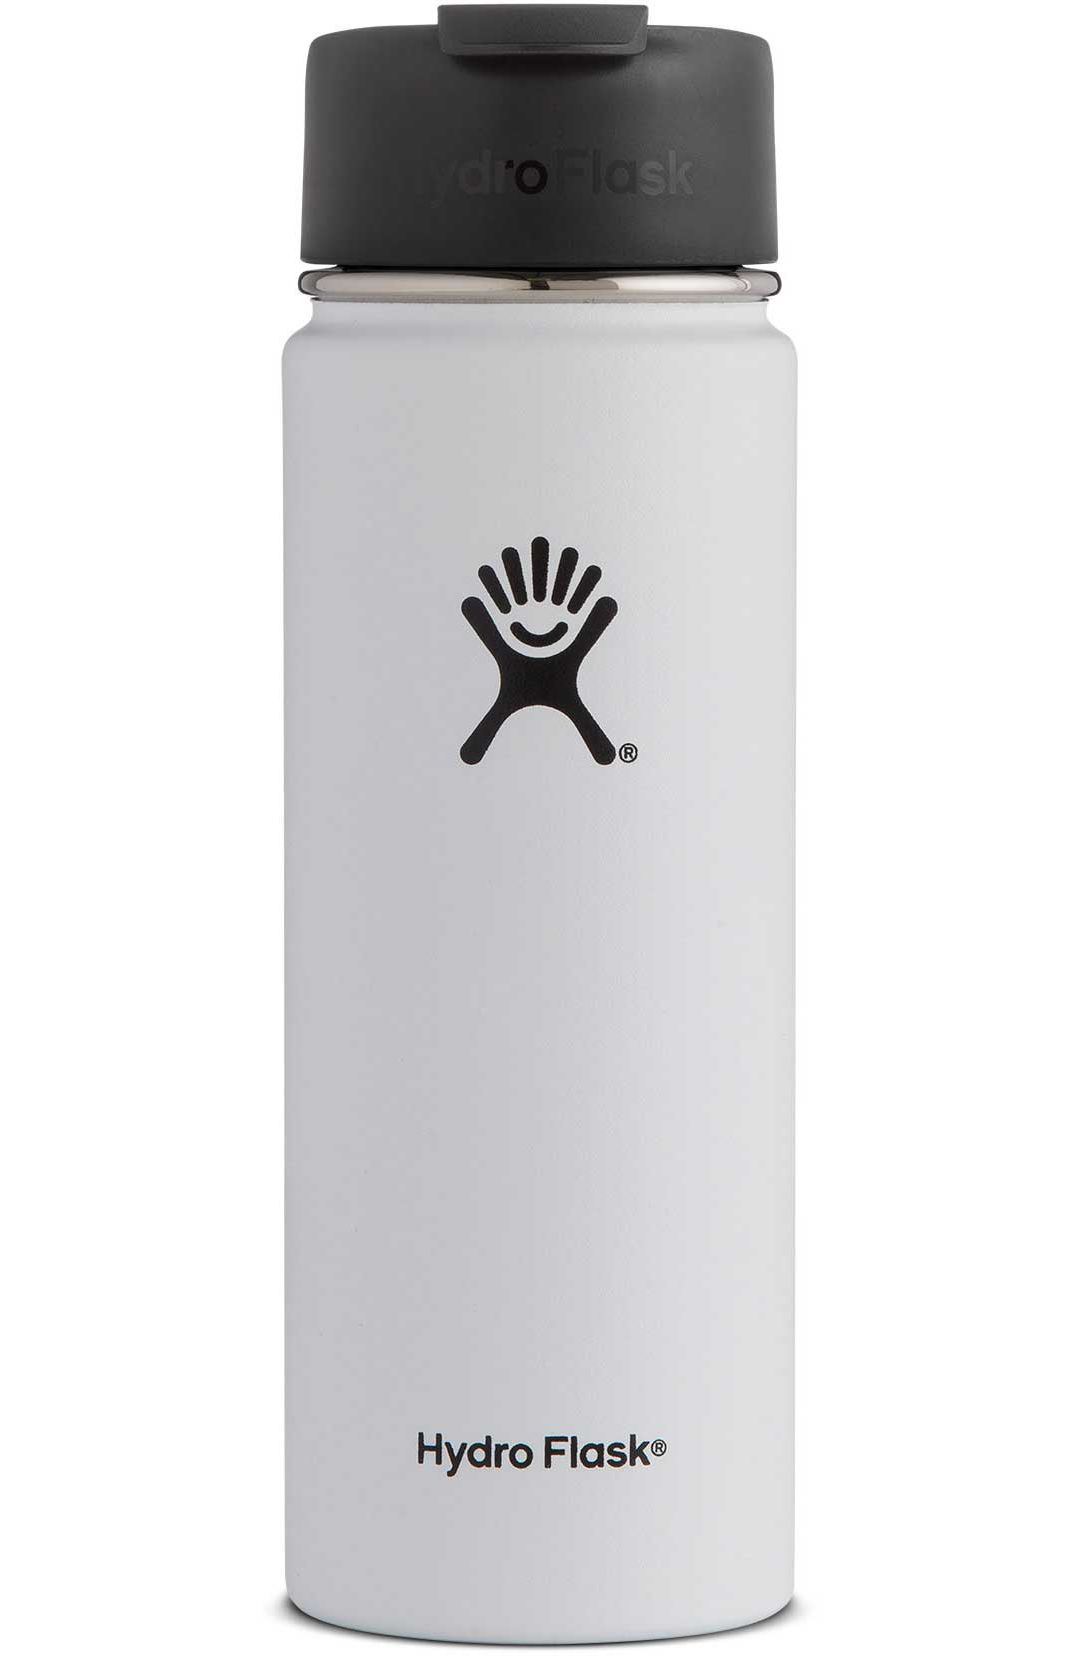 ba9bef1e74 Hydro Flask Flip Top 20 oz. Bottle | DICK'S Sporting Goods